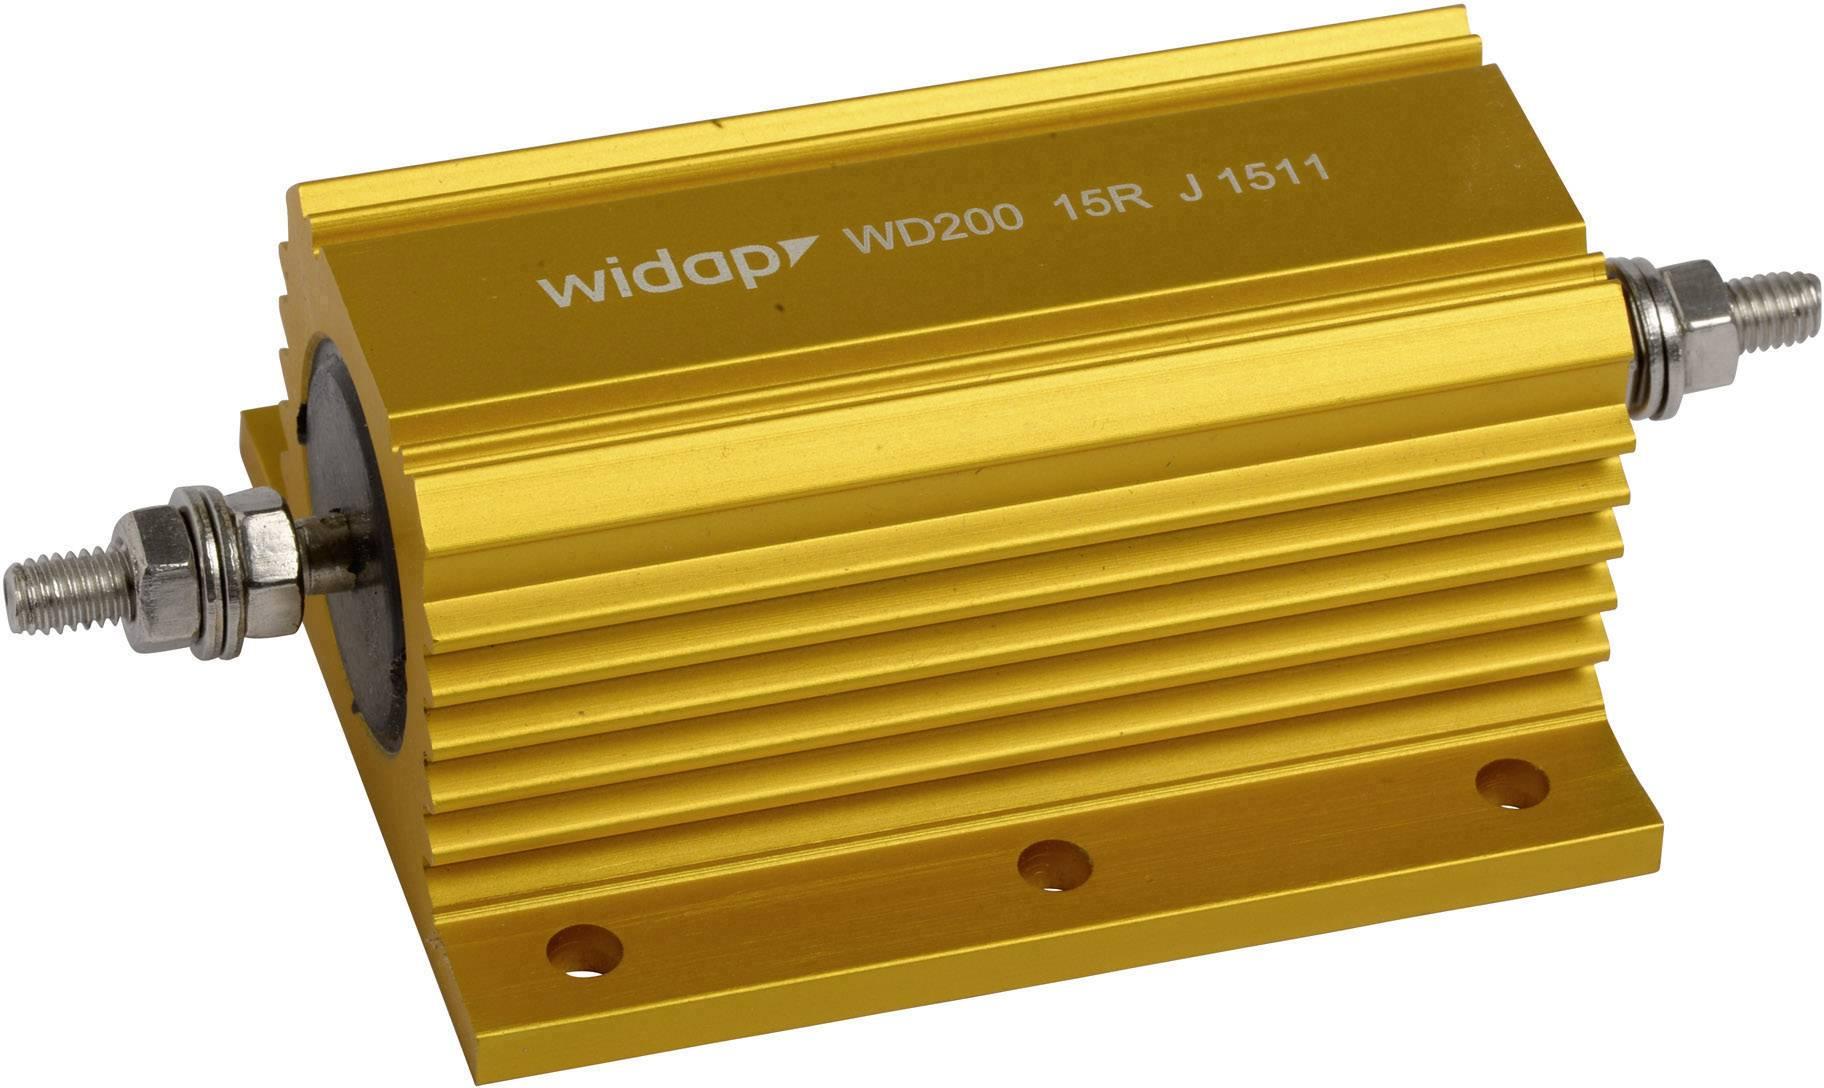 Drôtový rezistor Widap 160146, hodnota odporu 2.2 Ohm, 200 W, 1 ks